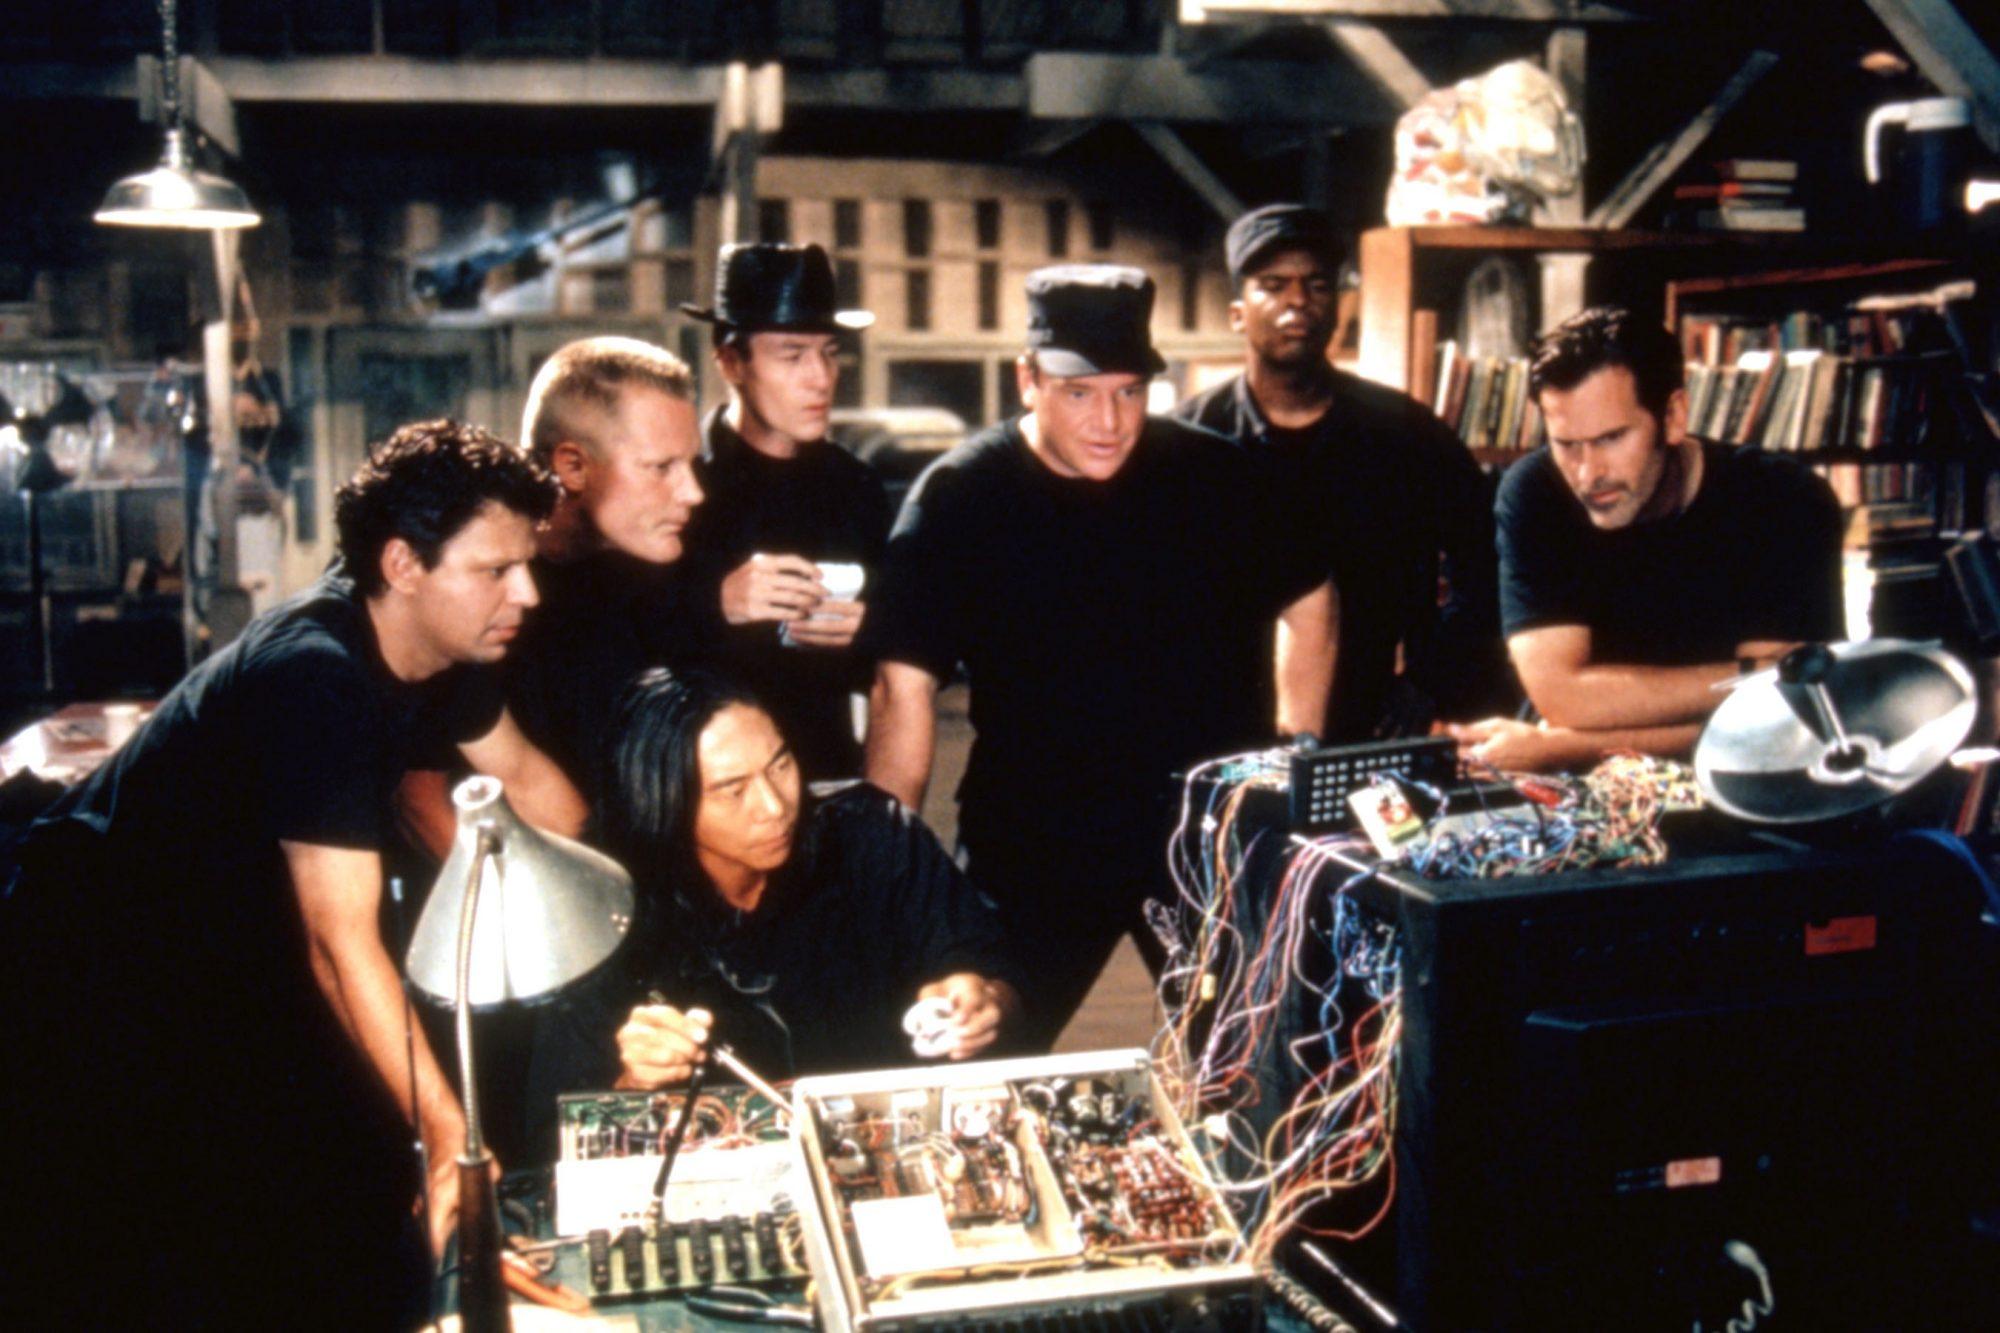 MCHALE'S NAVY, Danton Stone, Brian Haley, Henry Cho (seated), French Stewart, Tom Arnold, David Alan